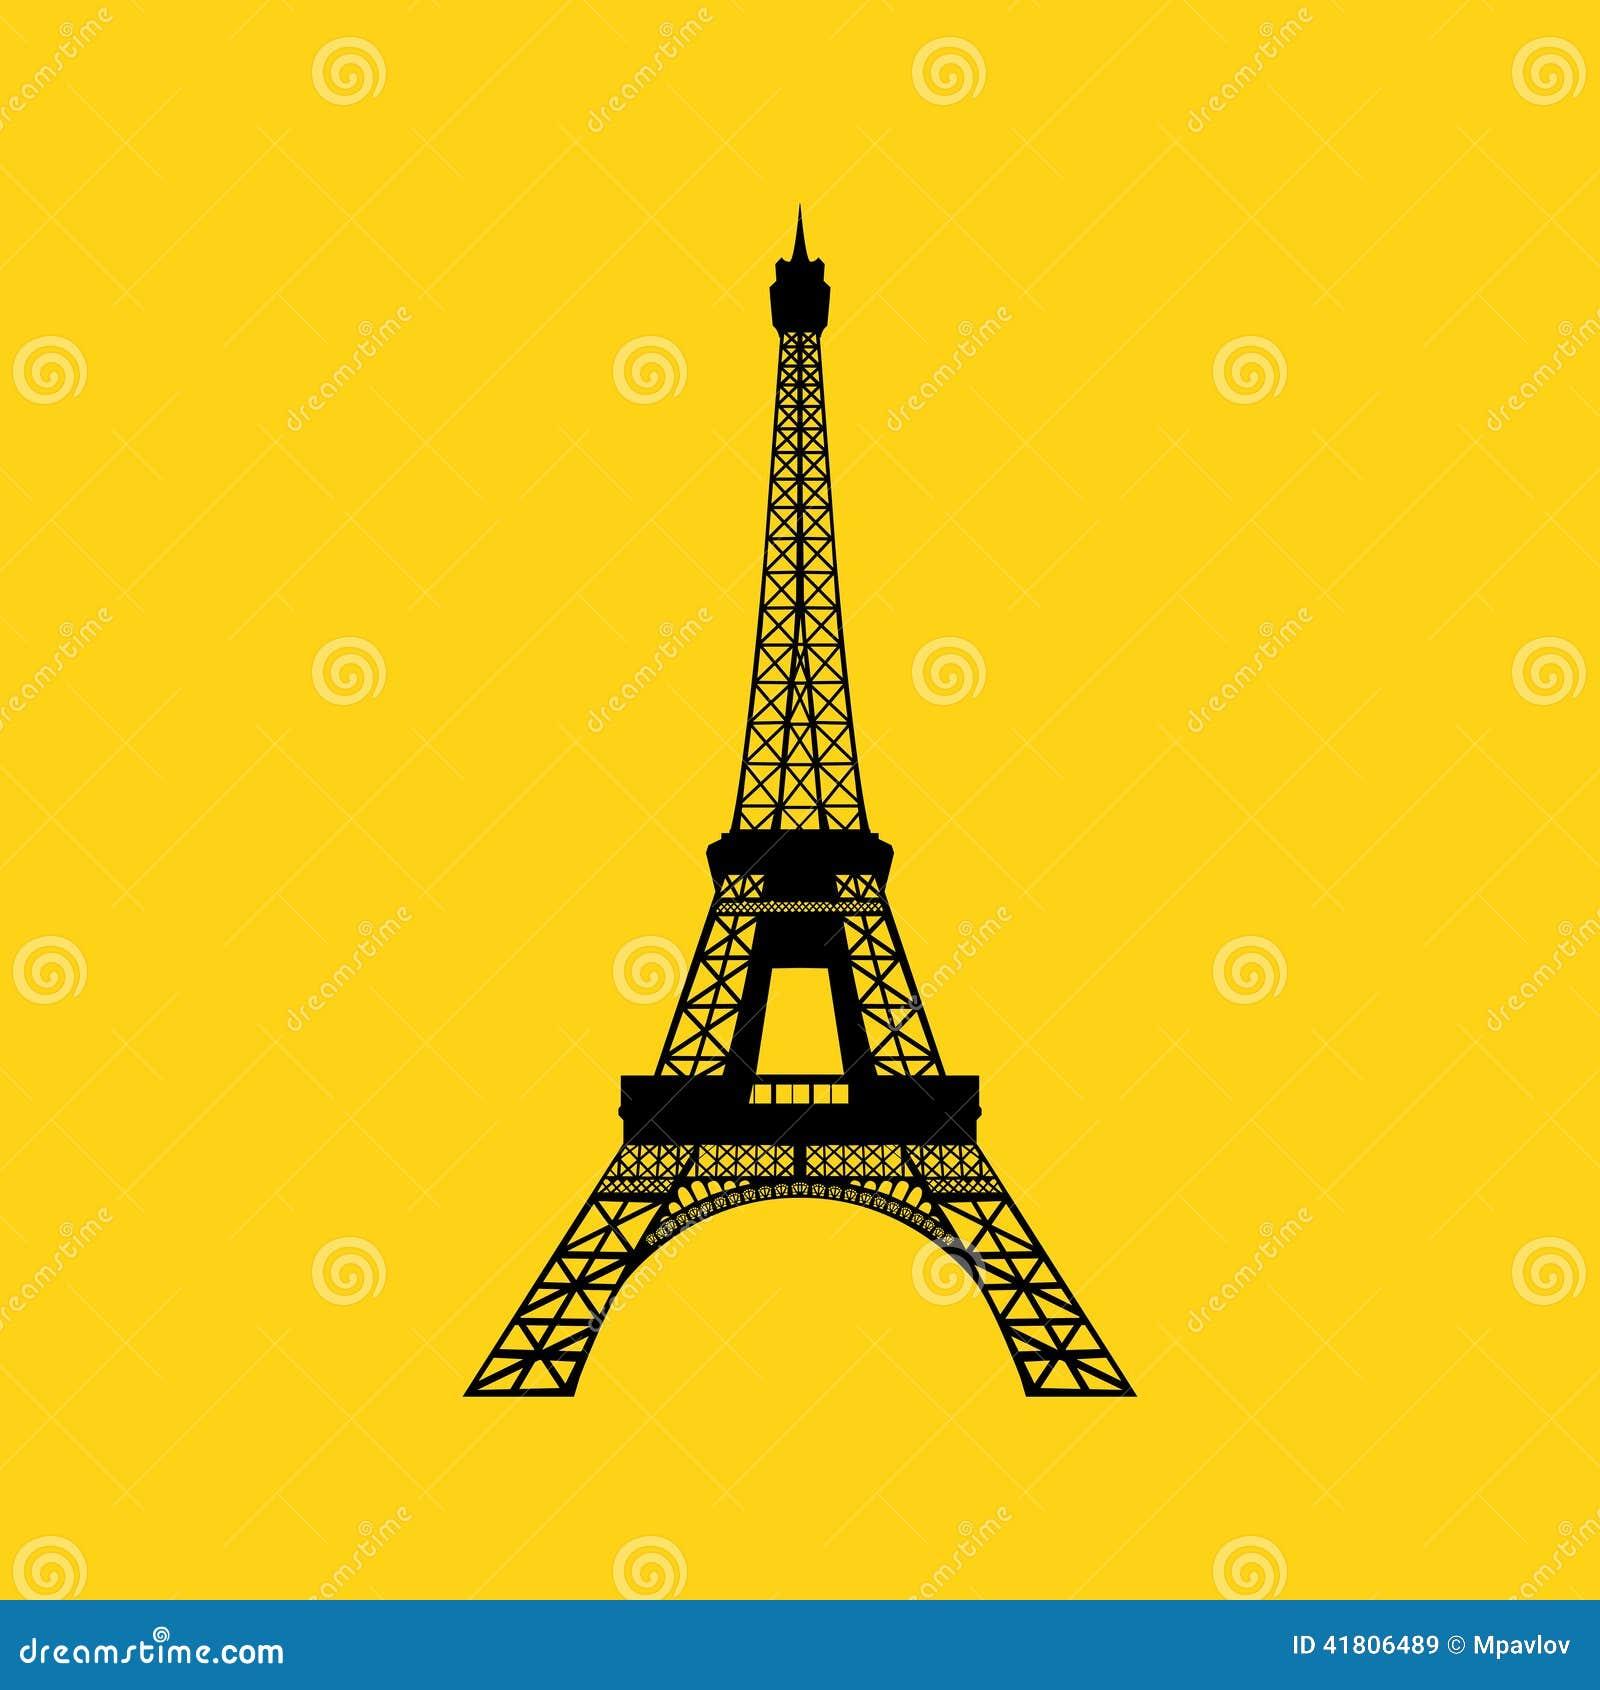 Paris Illustration: Eiffel Tower In Paris Stock Vector. Illustration Of City